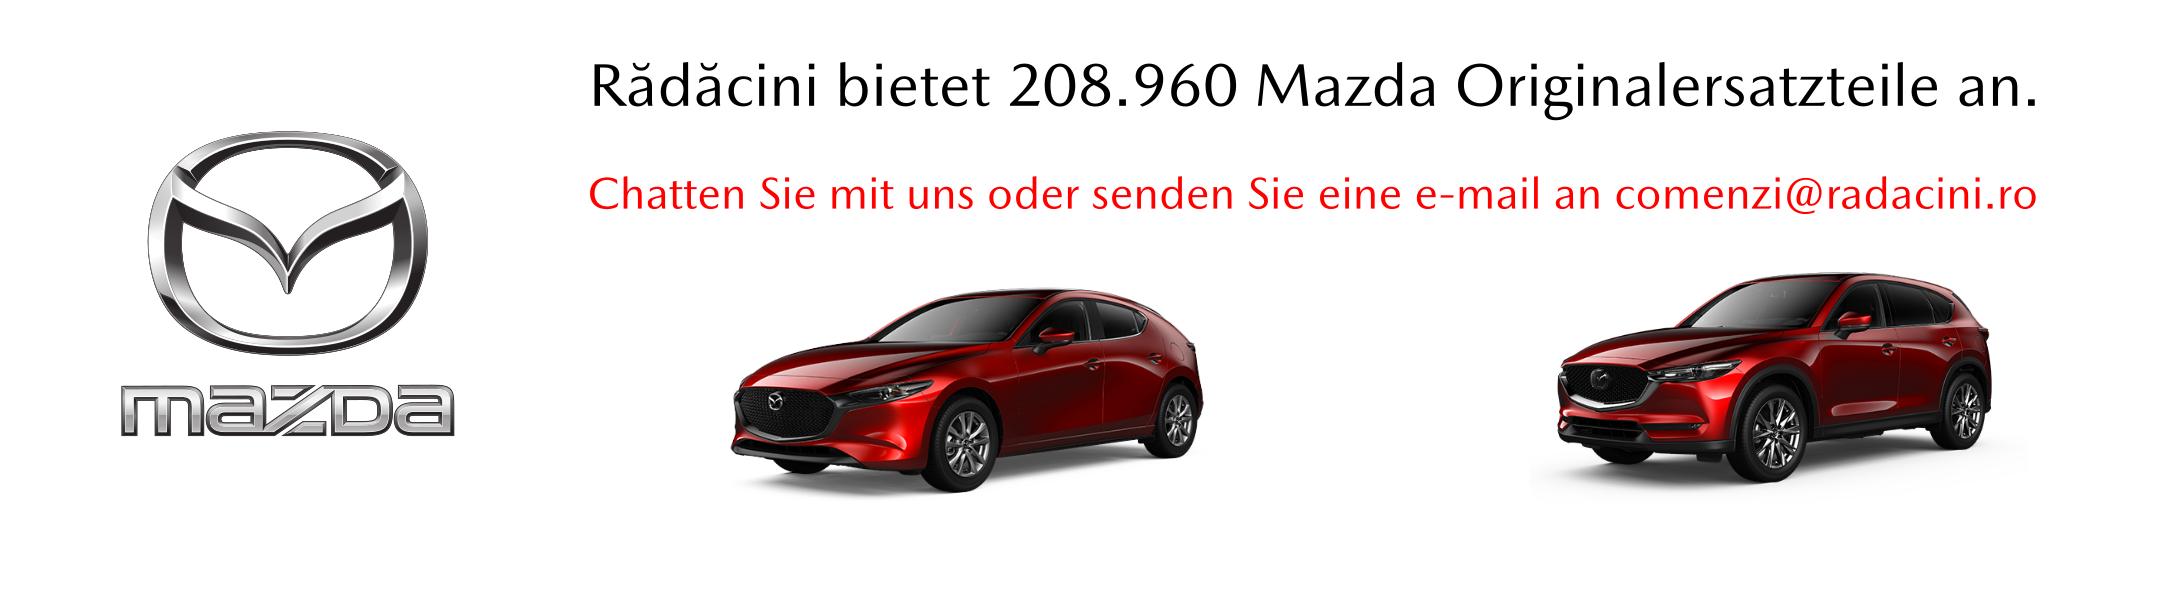 Originalersatzteile Mazda